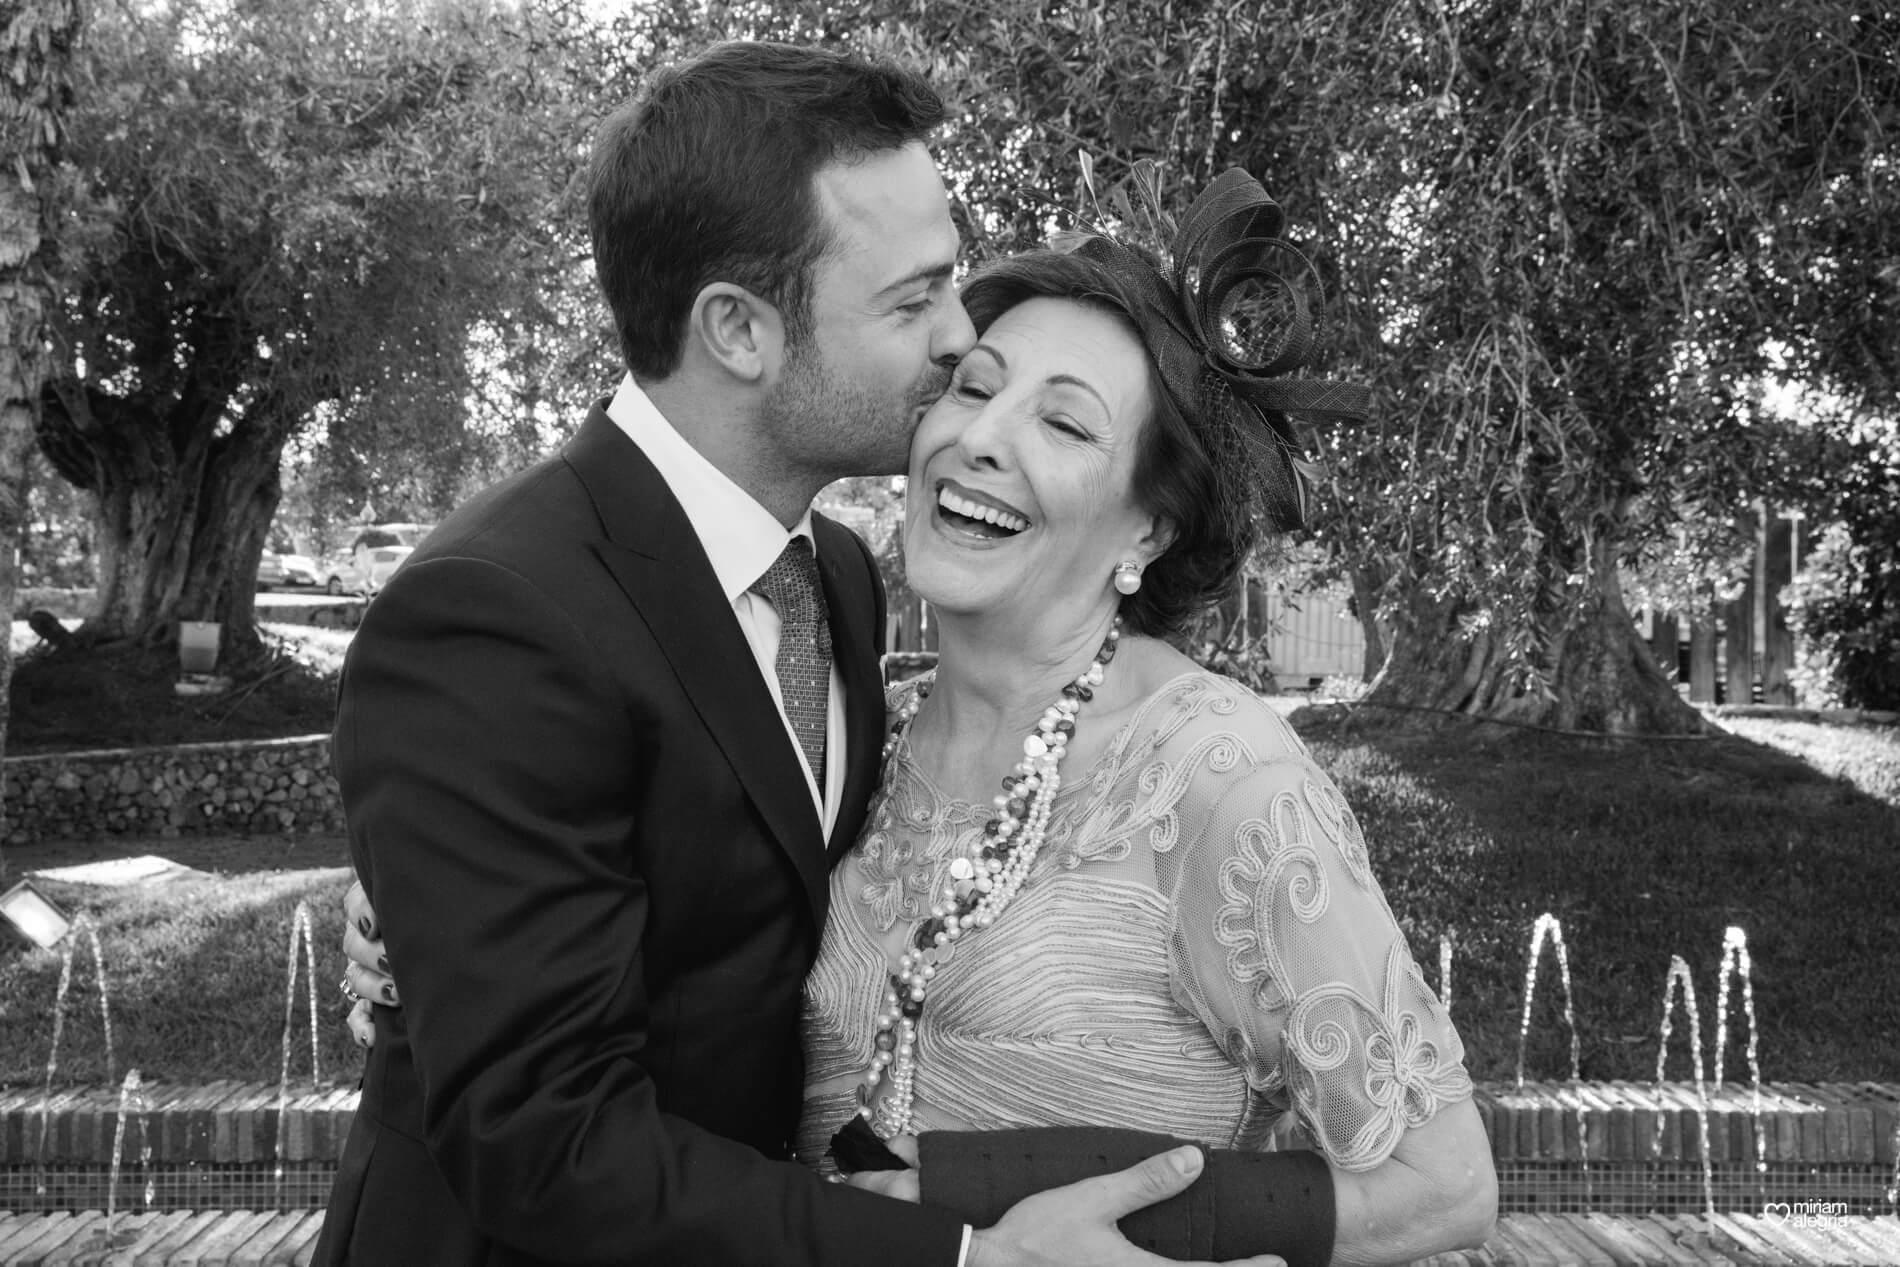 vestido-de-novia-paula-del-vas-miriam-alegria-fotografos-boda-murcia-115